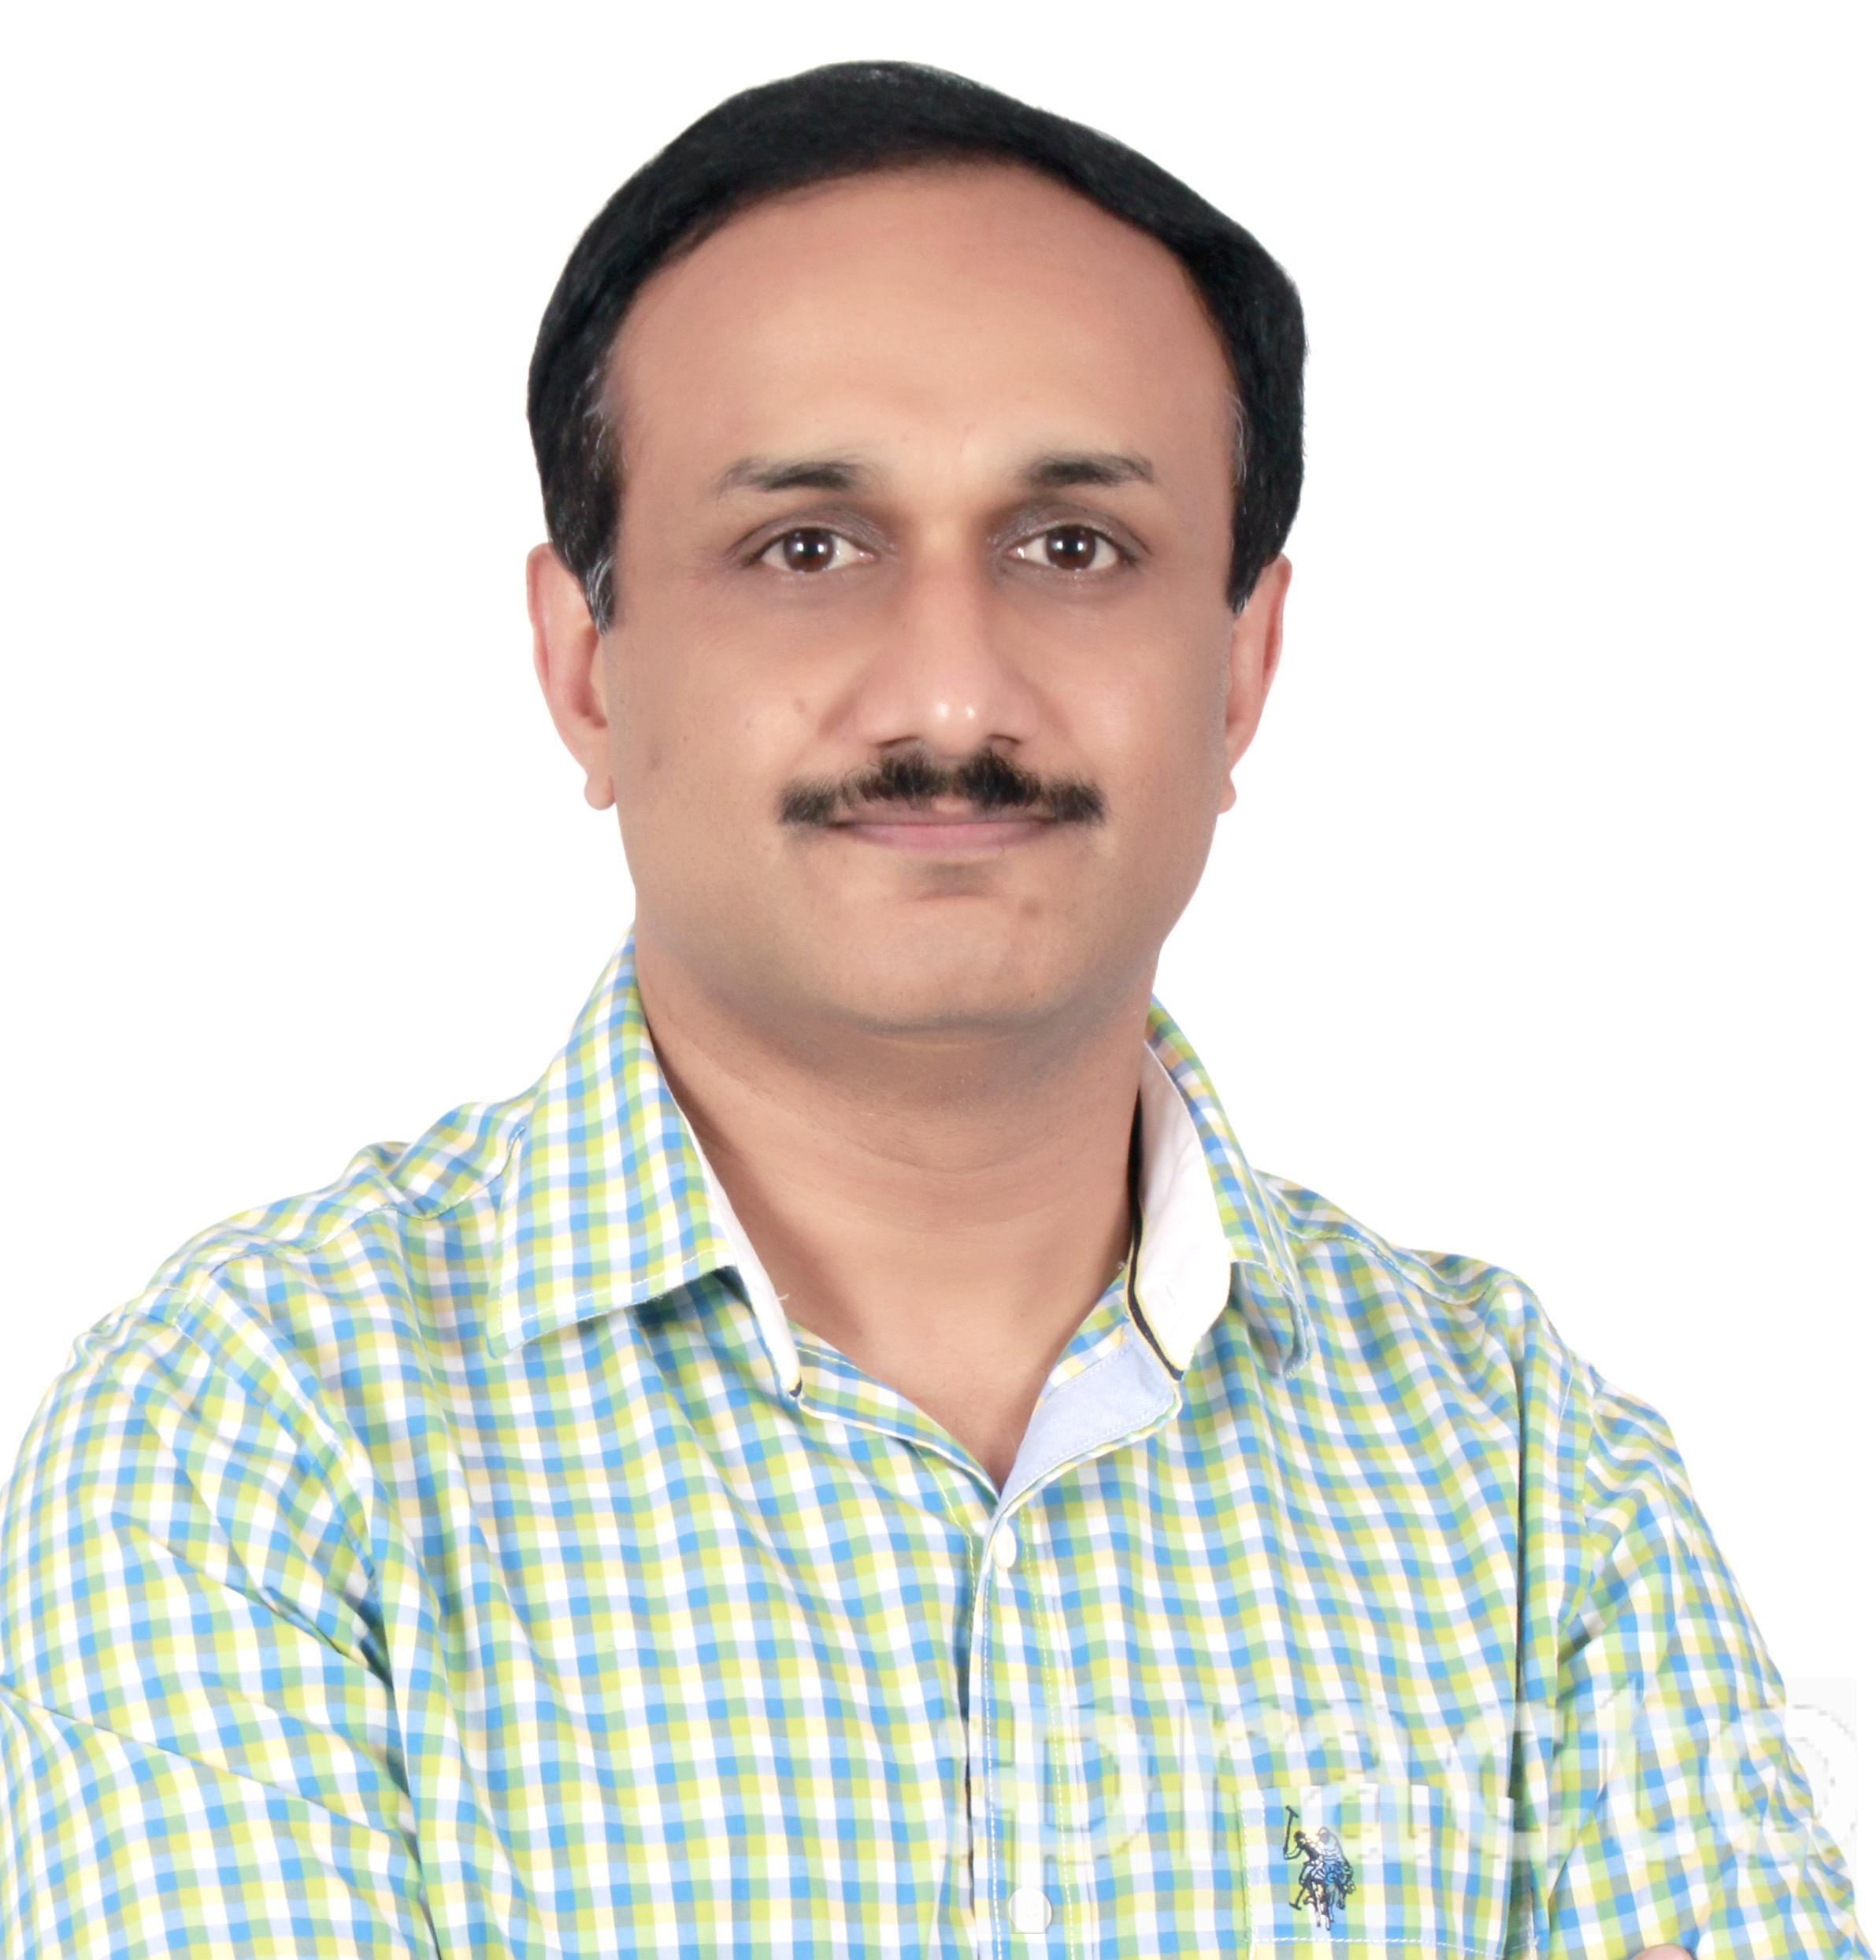 Dr. Satish Nair - Head and Neck Surgeon